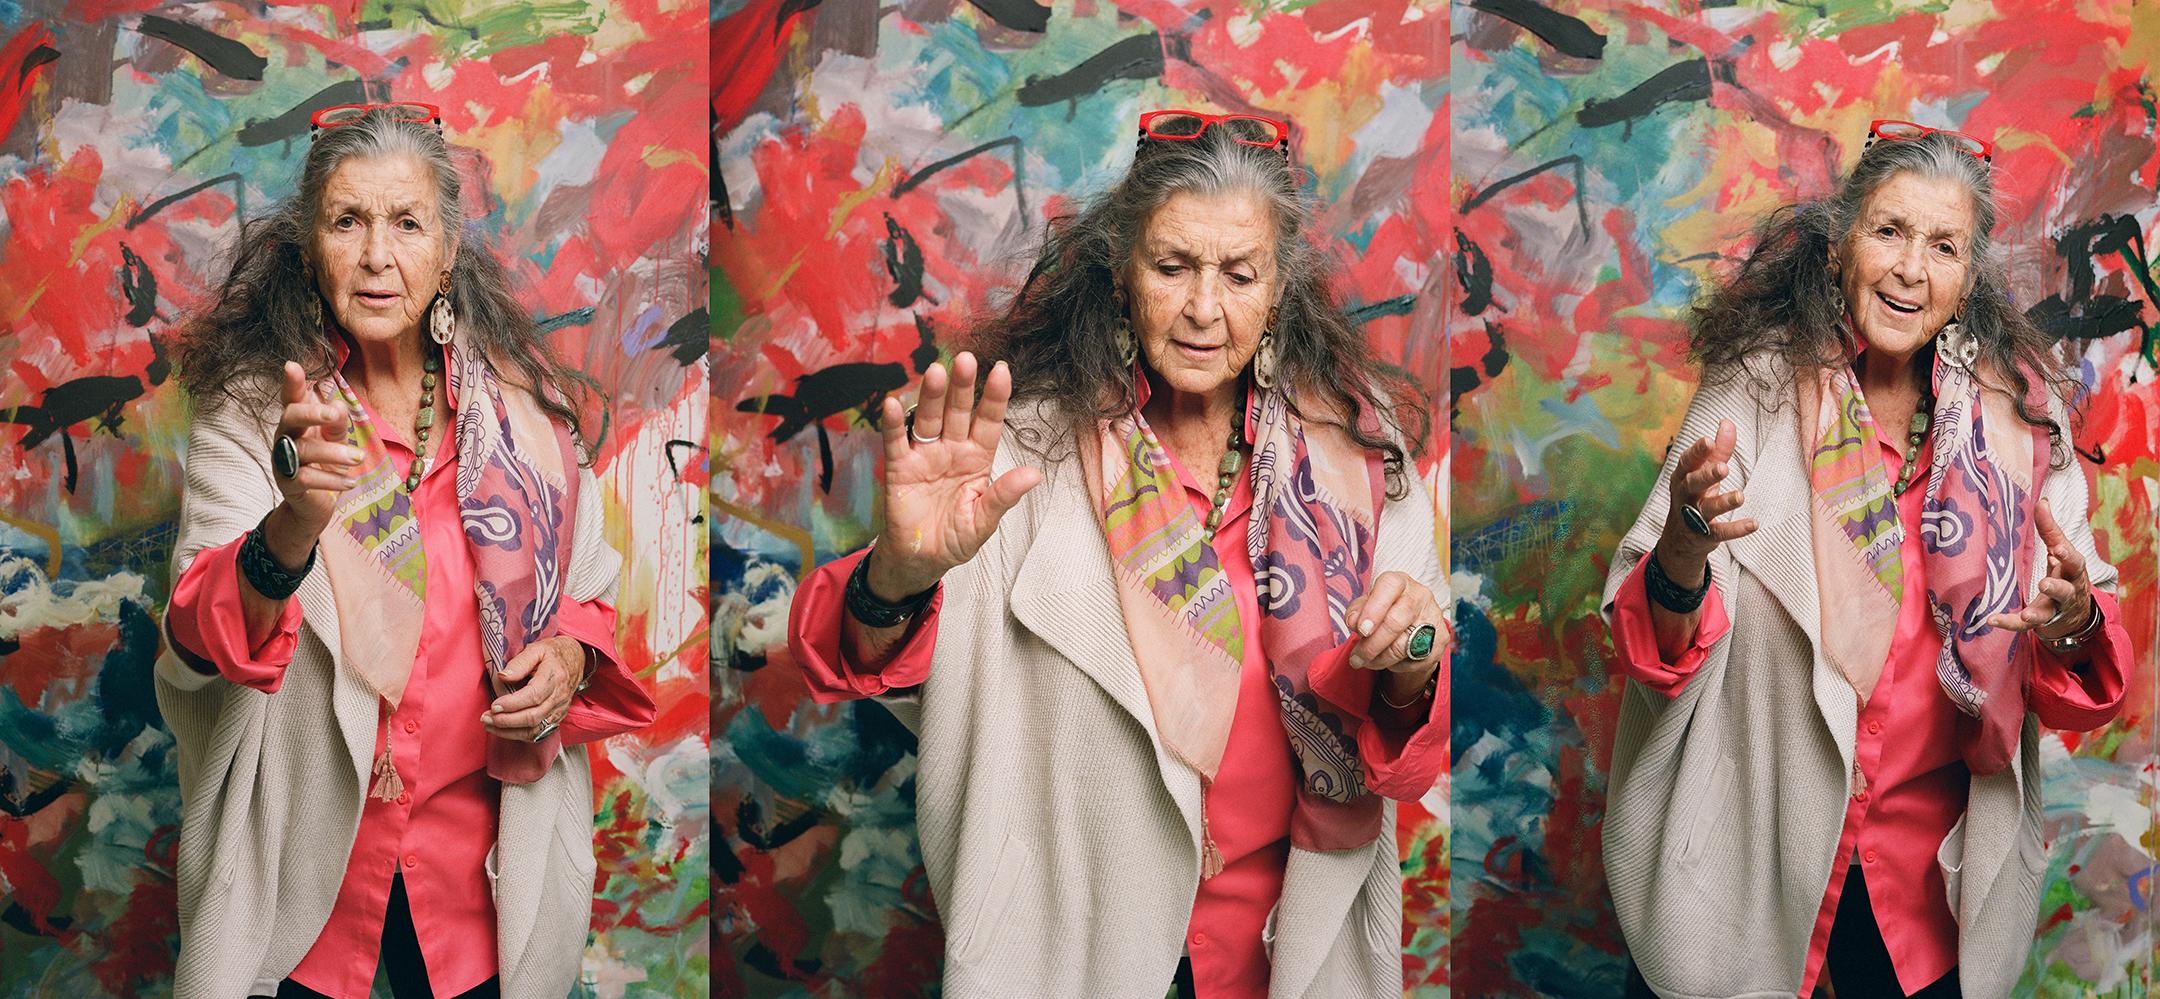 Neltje_Triptych_Colorful_Paintings_Portrait_Women_in_Wyoming.jpg